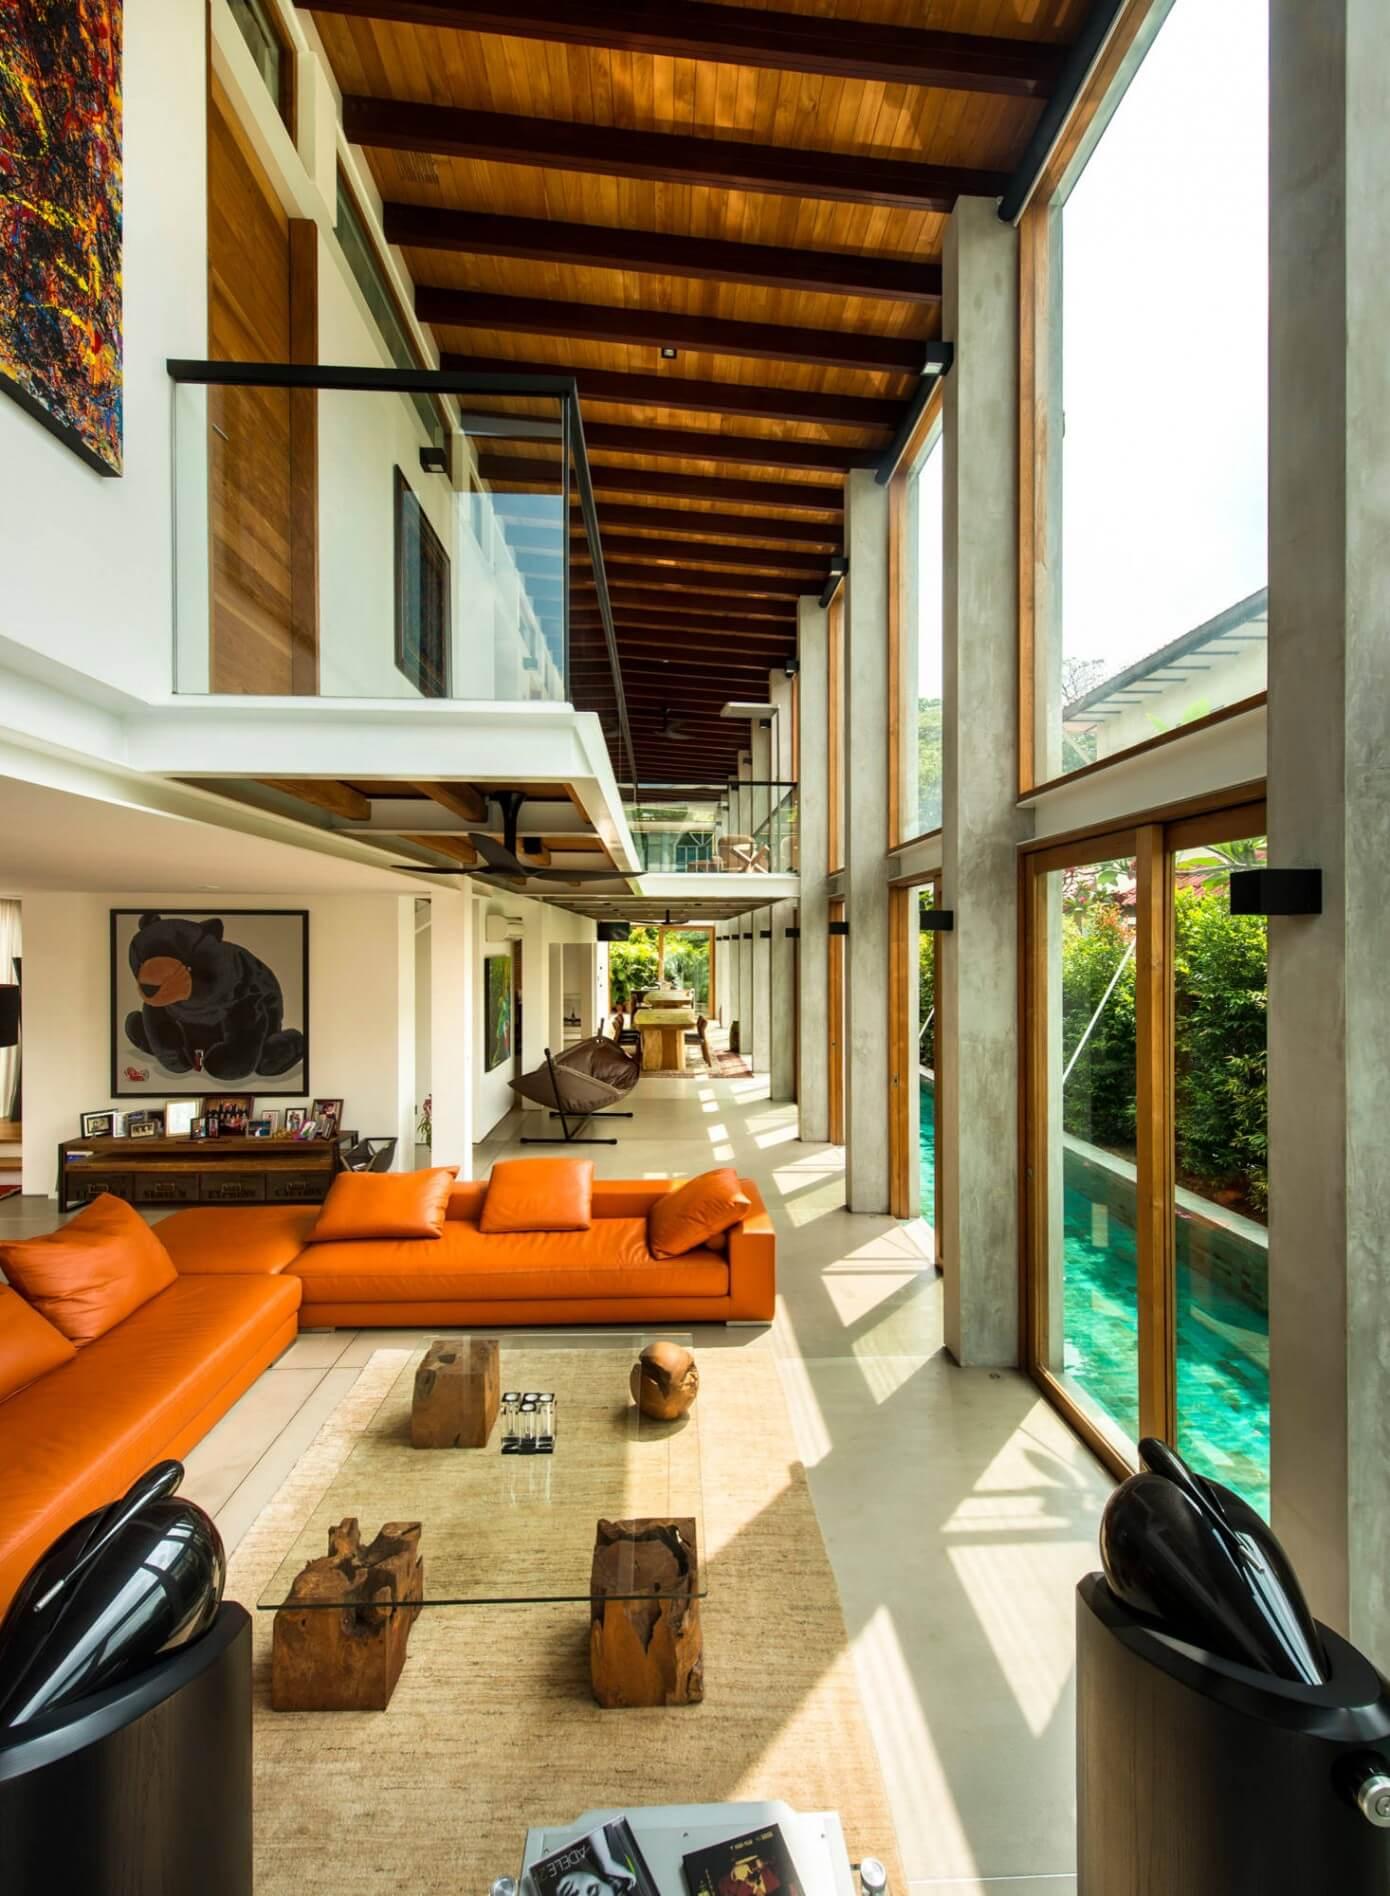 005 Bungalow Singapore Visual Text Architect Homeadore